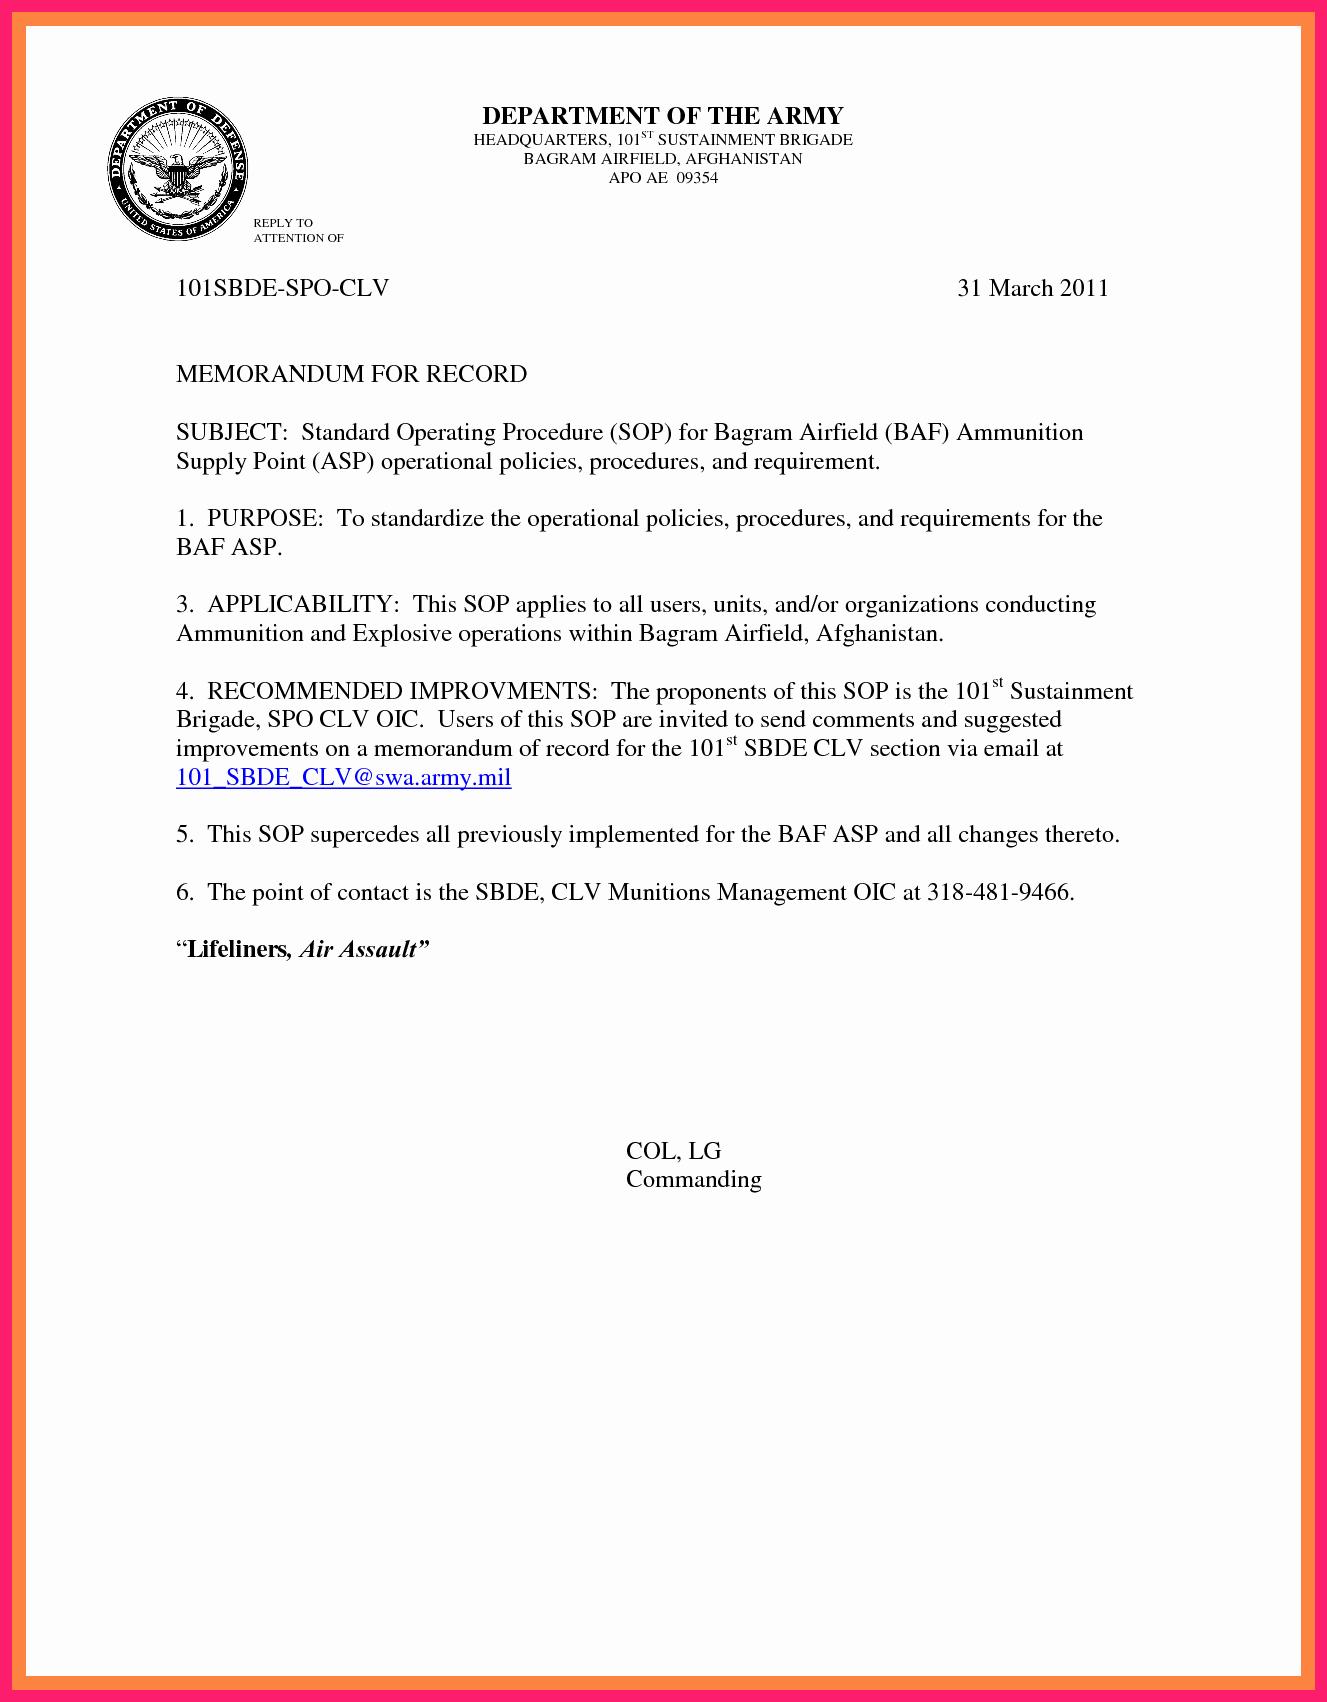 memorandum for record army